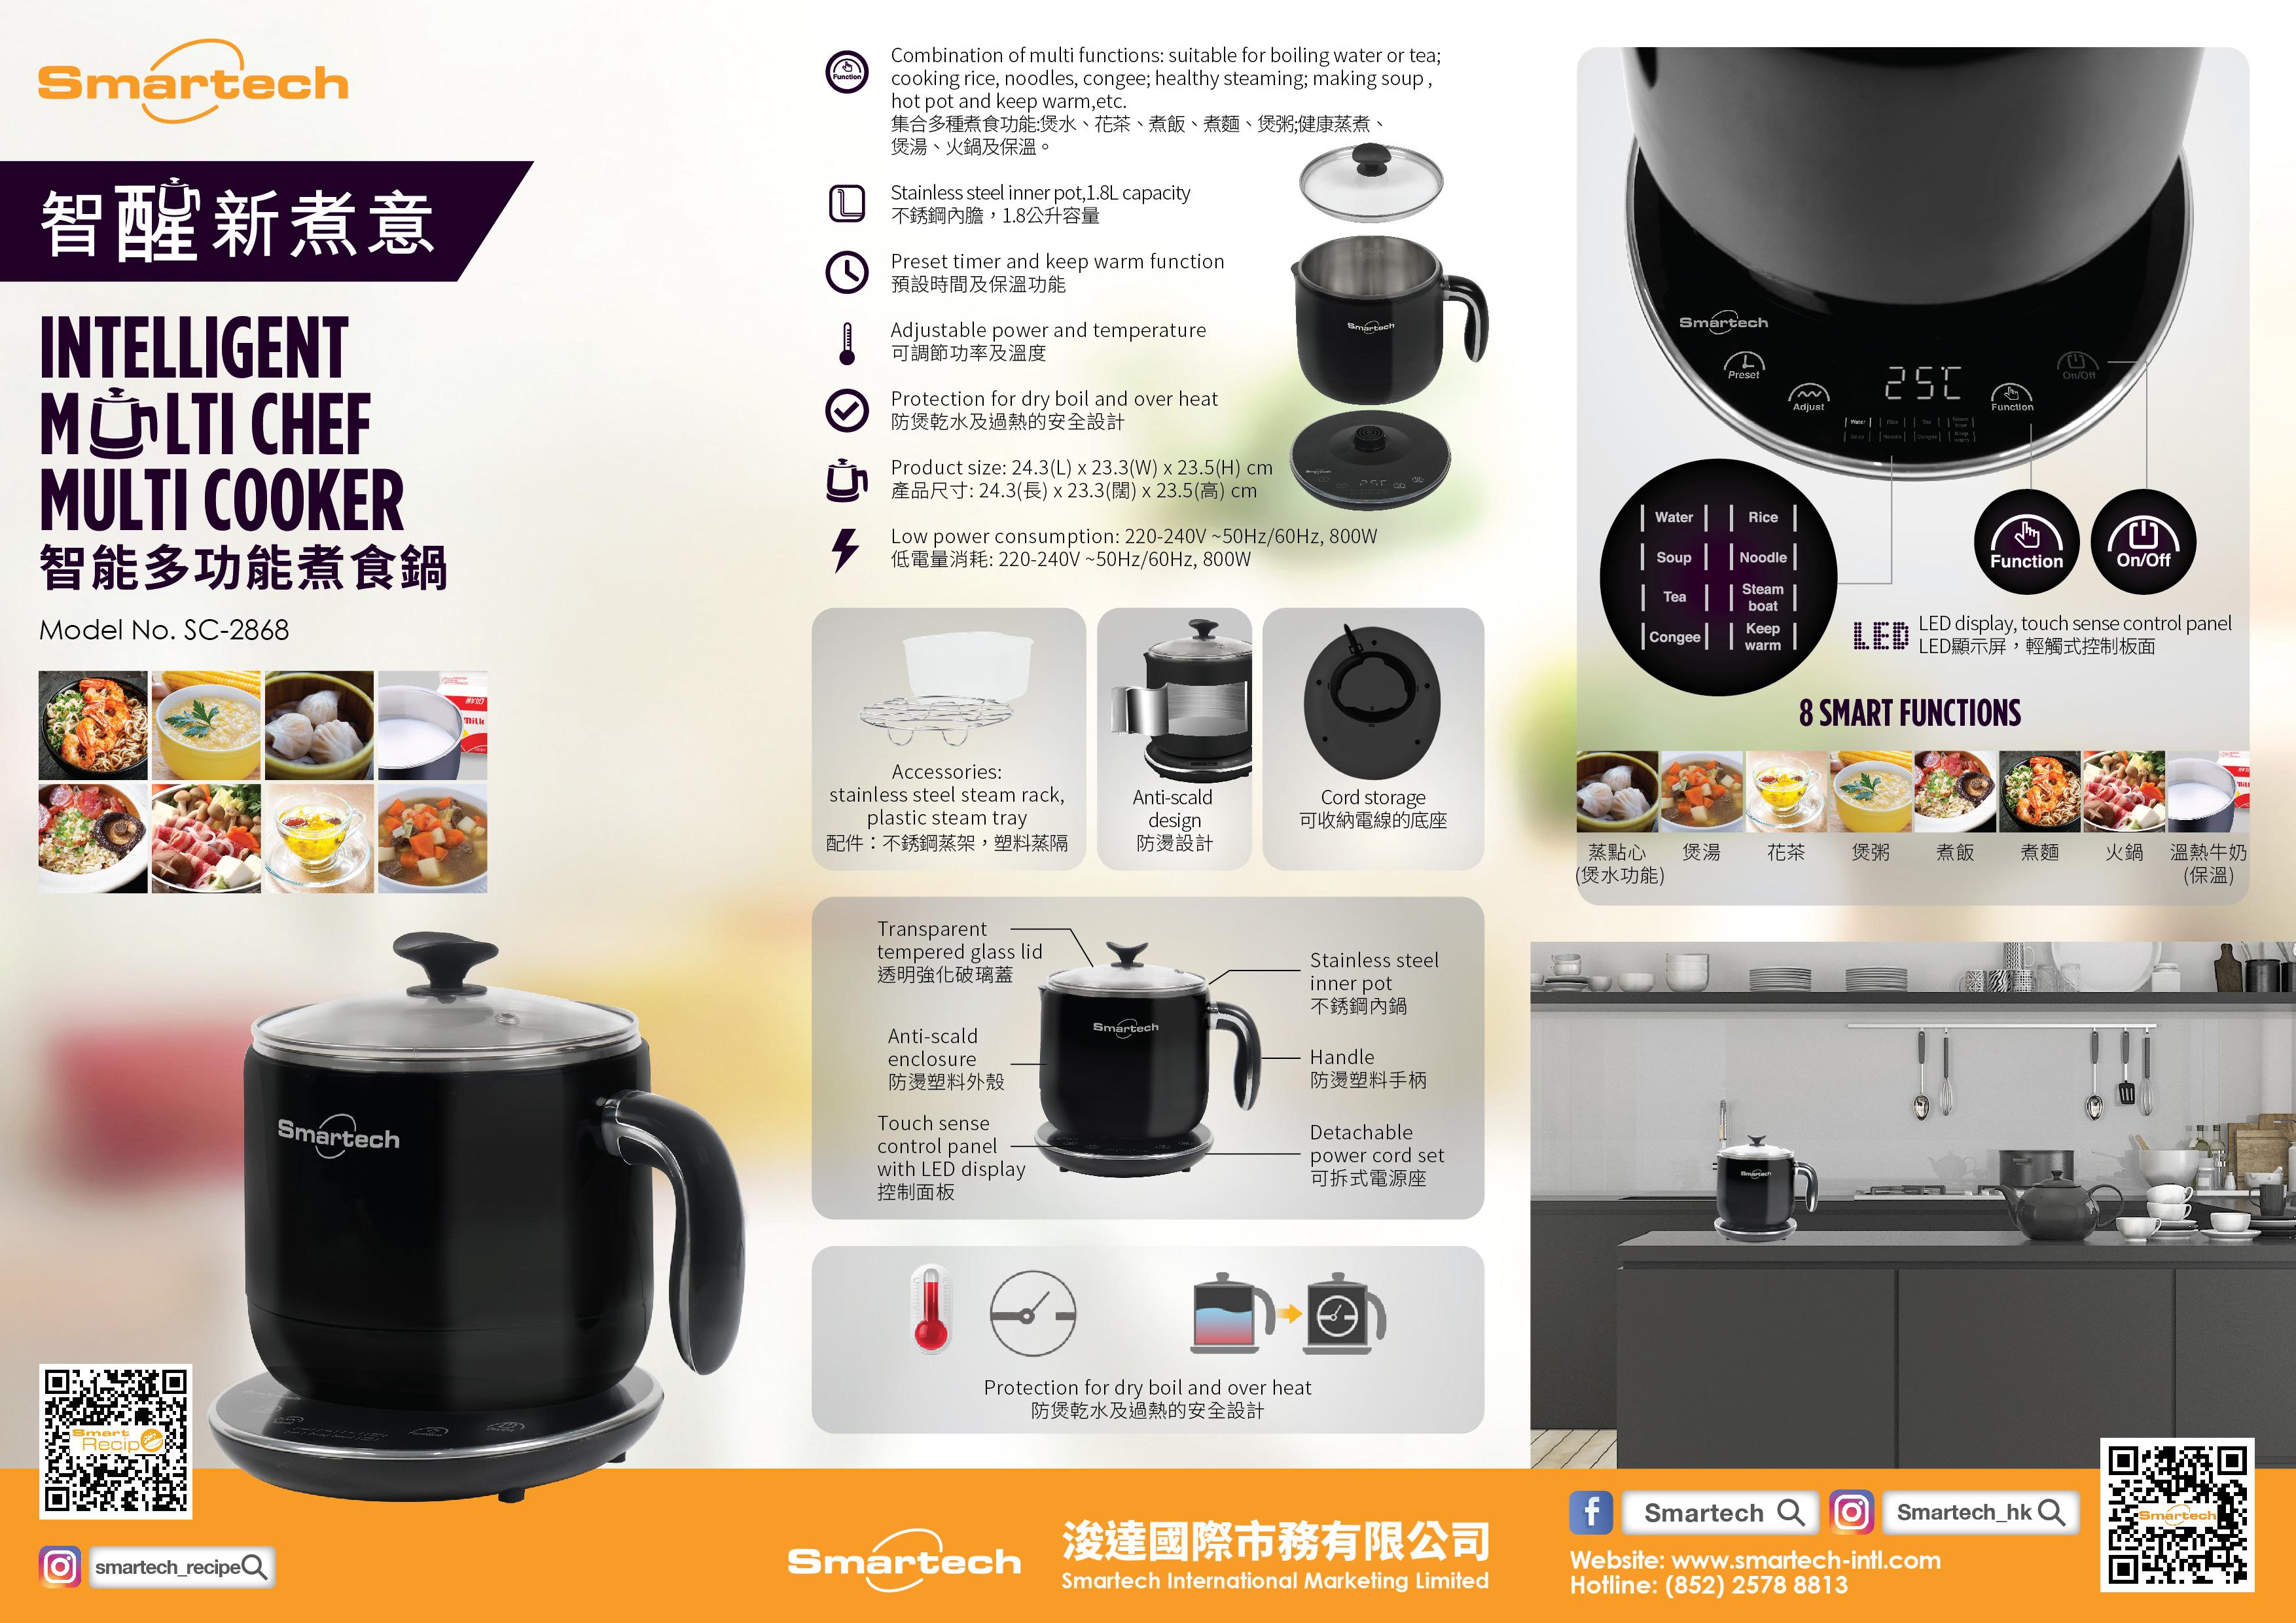 Smartech International Marketing Limited